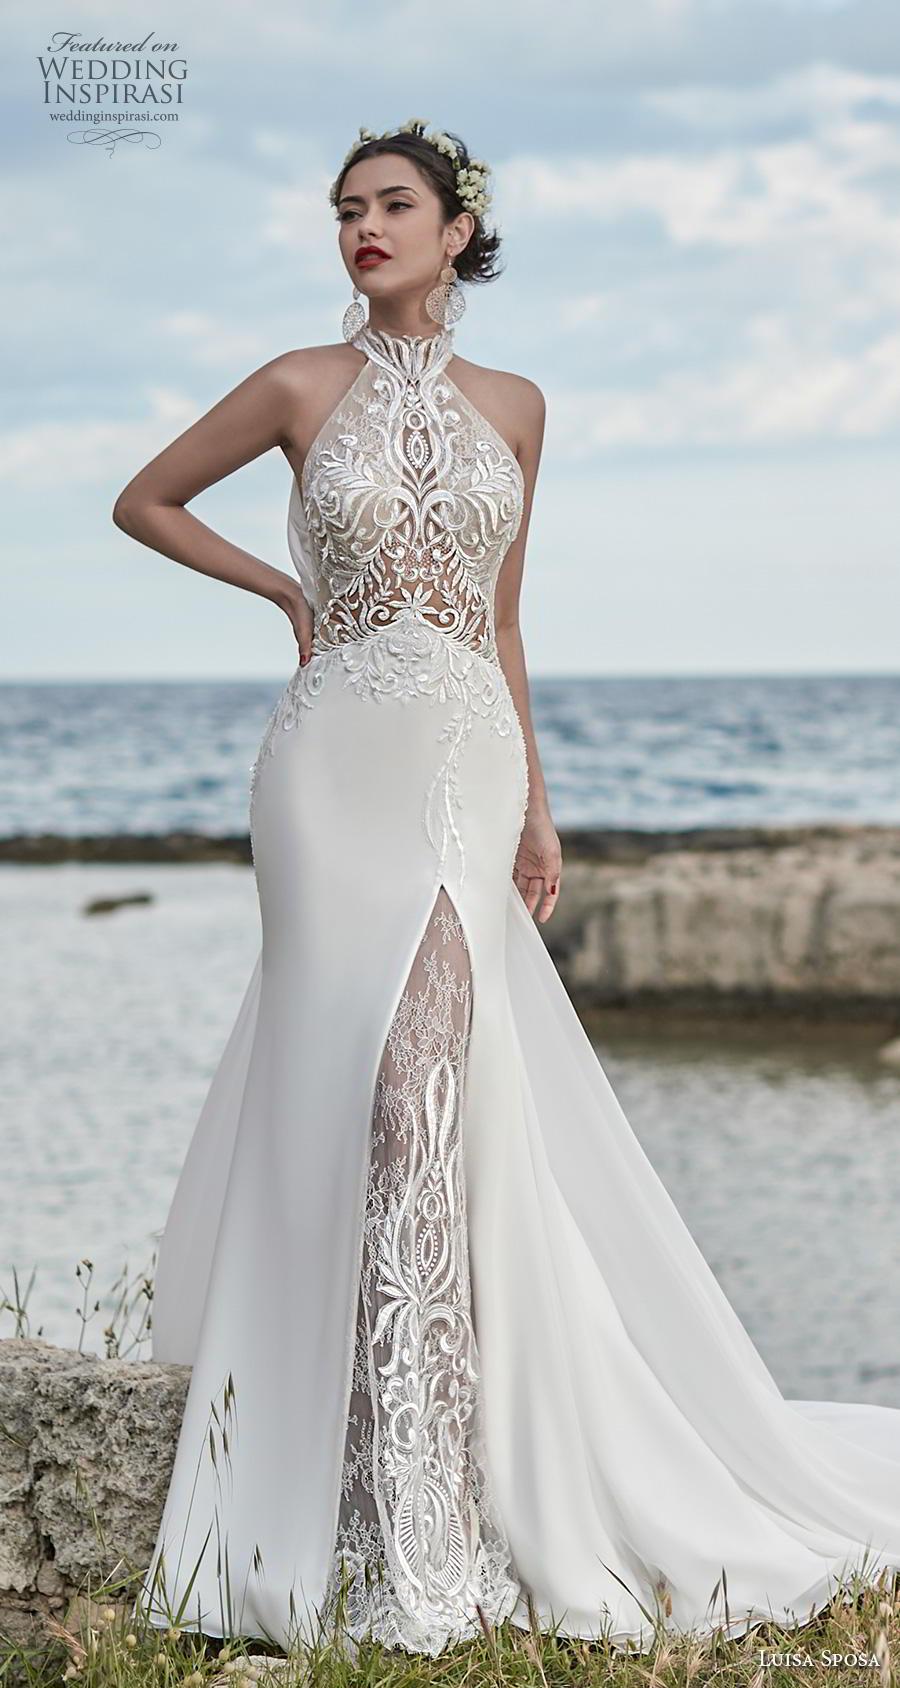 luisa sposa 2020 bridal sleeveless halter neck heavily embellished bodice elegant fit and flare wedding dress lace back chapel train (24) mv